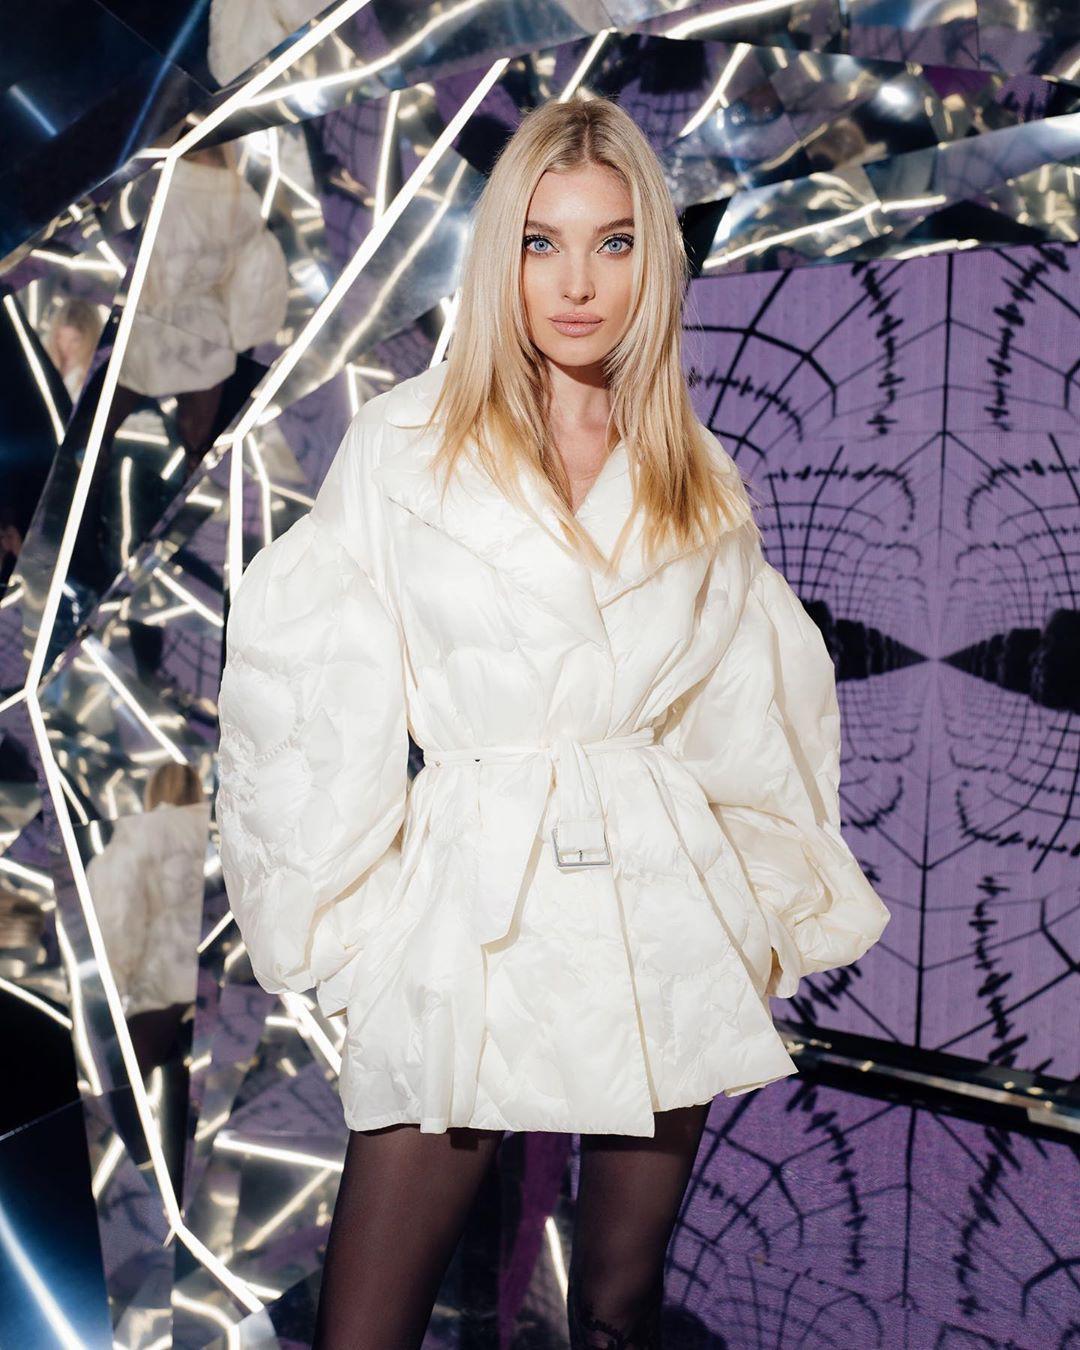 Elsa Hosk coat style outfit, natural blong hairs, Long Hair Girl